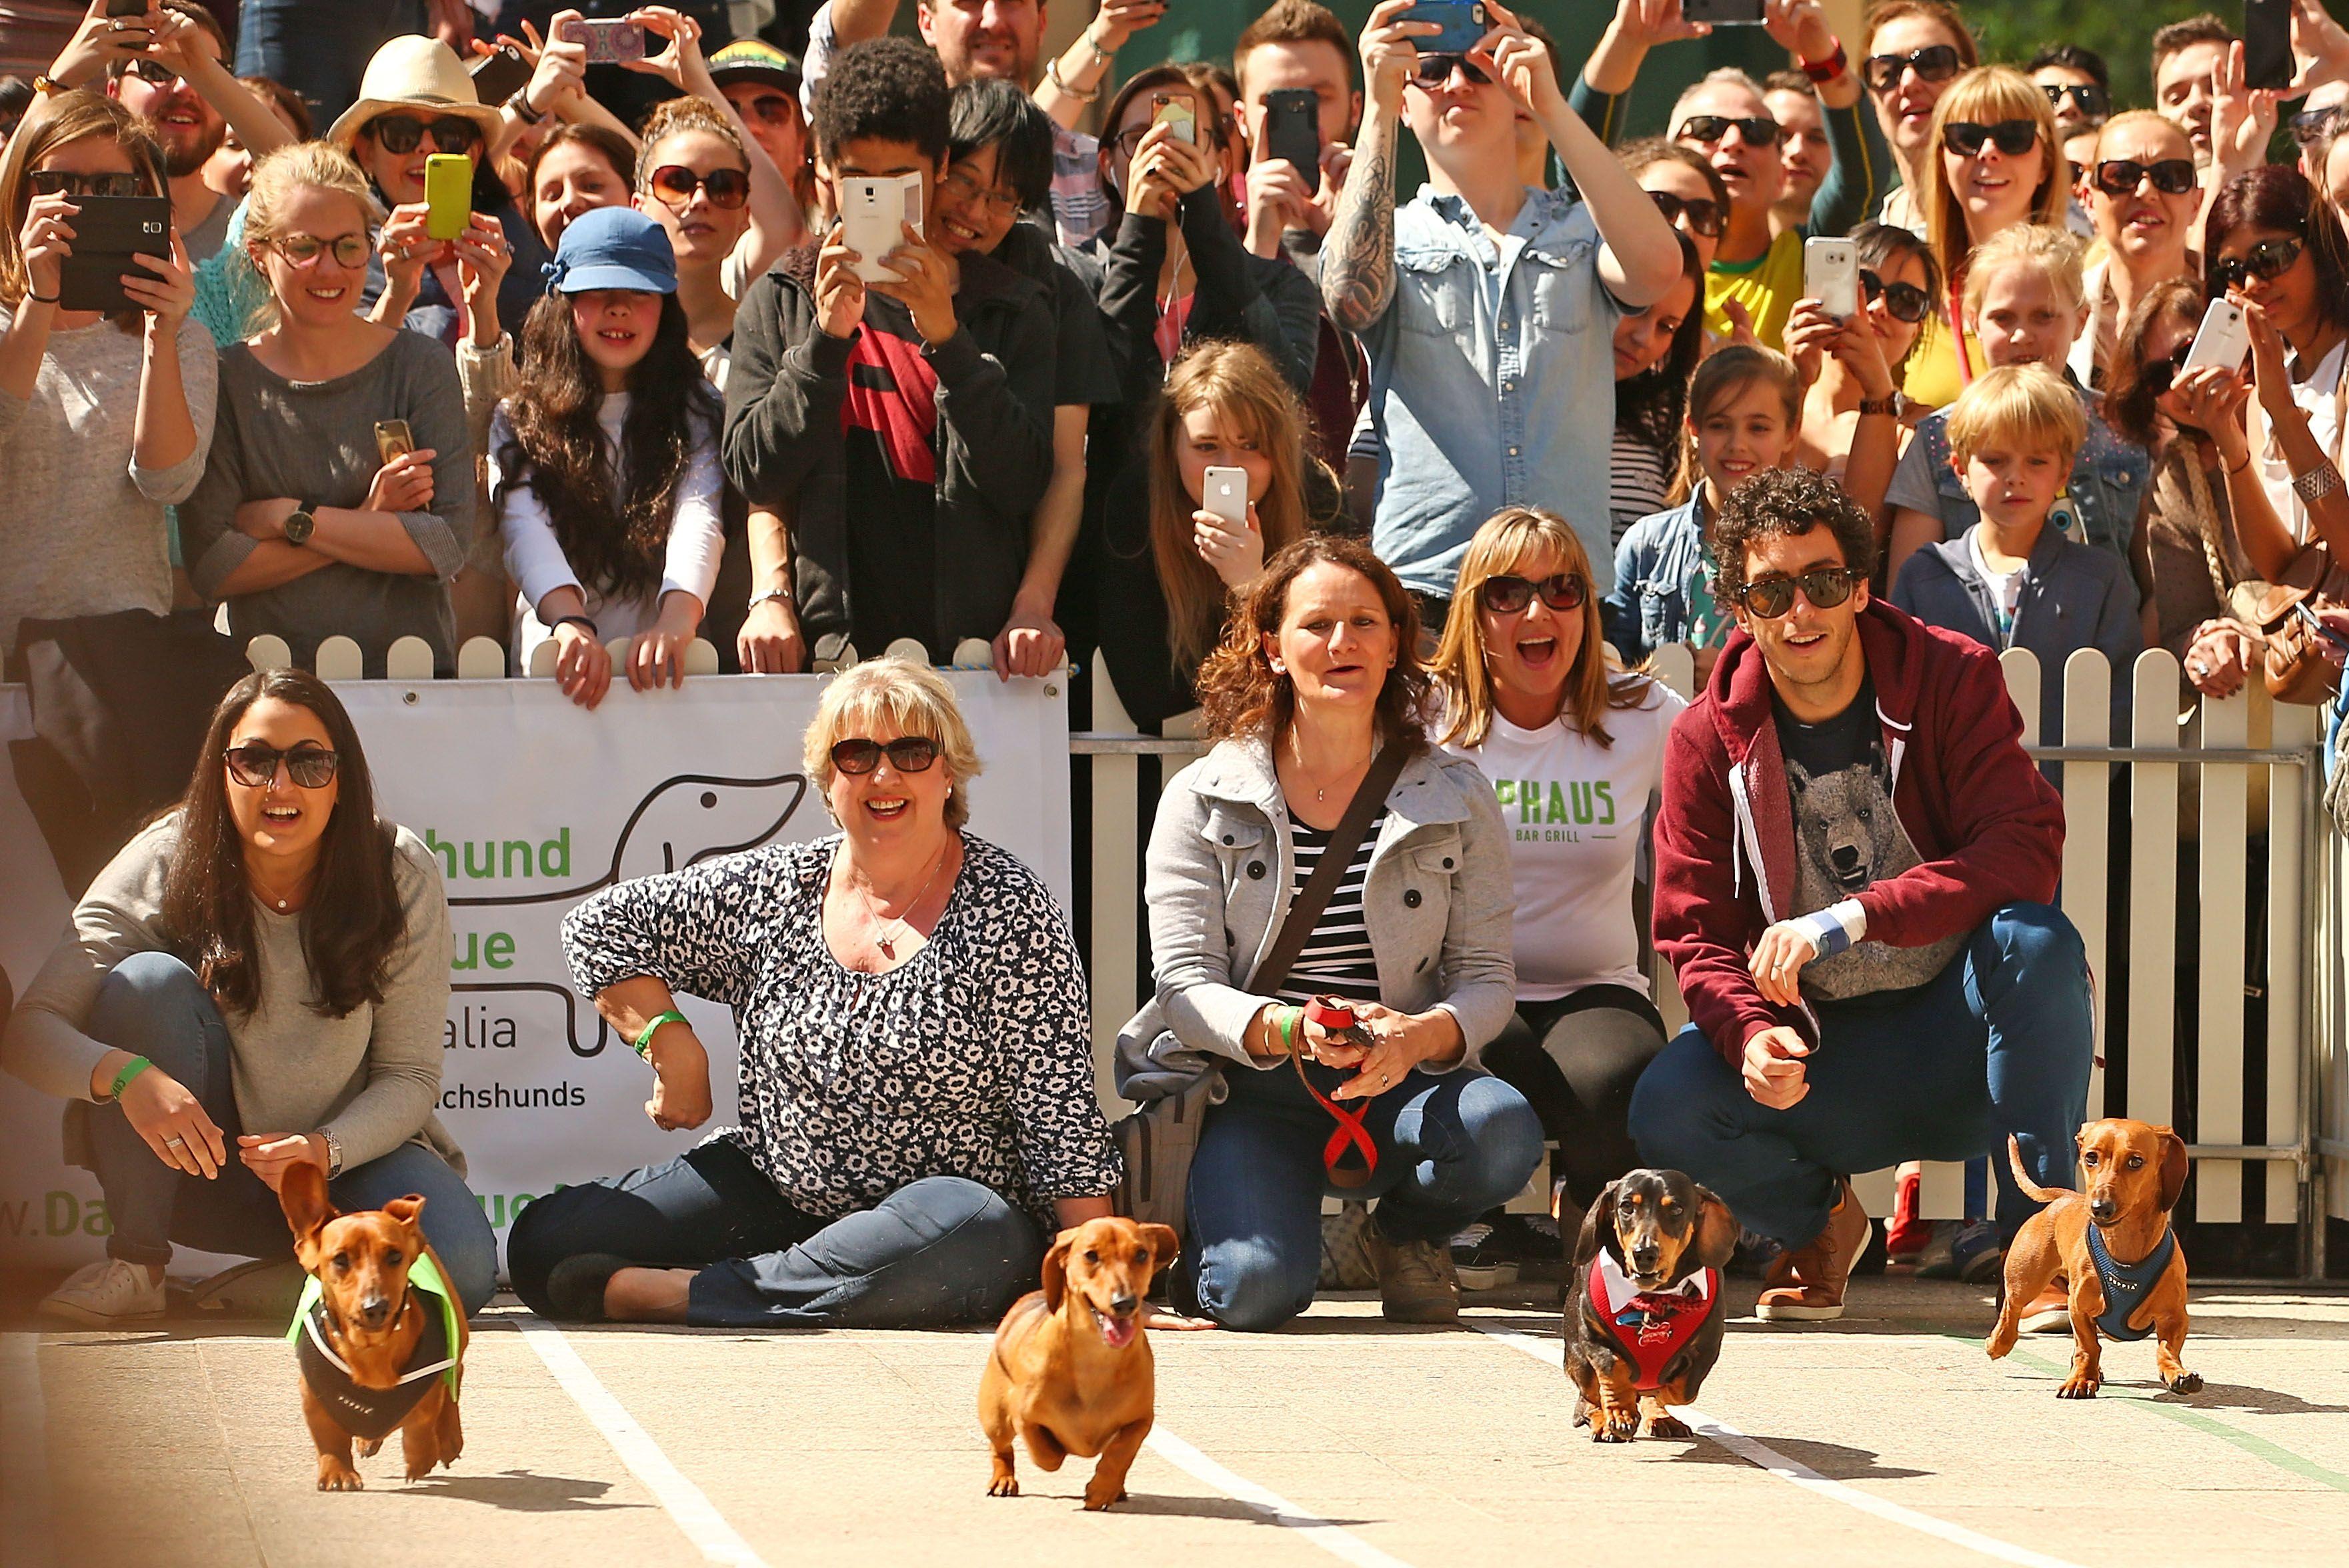 Dachshund dash inaugural running of the wieners race in